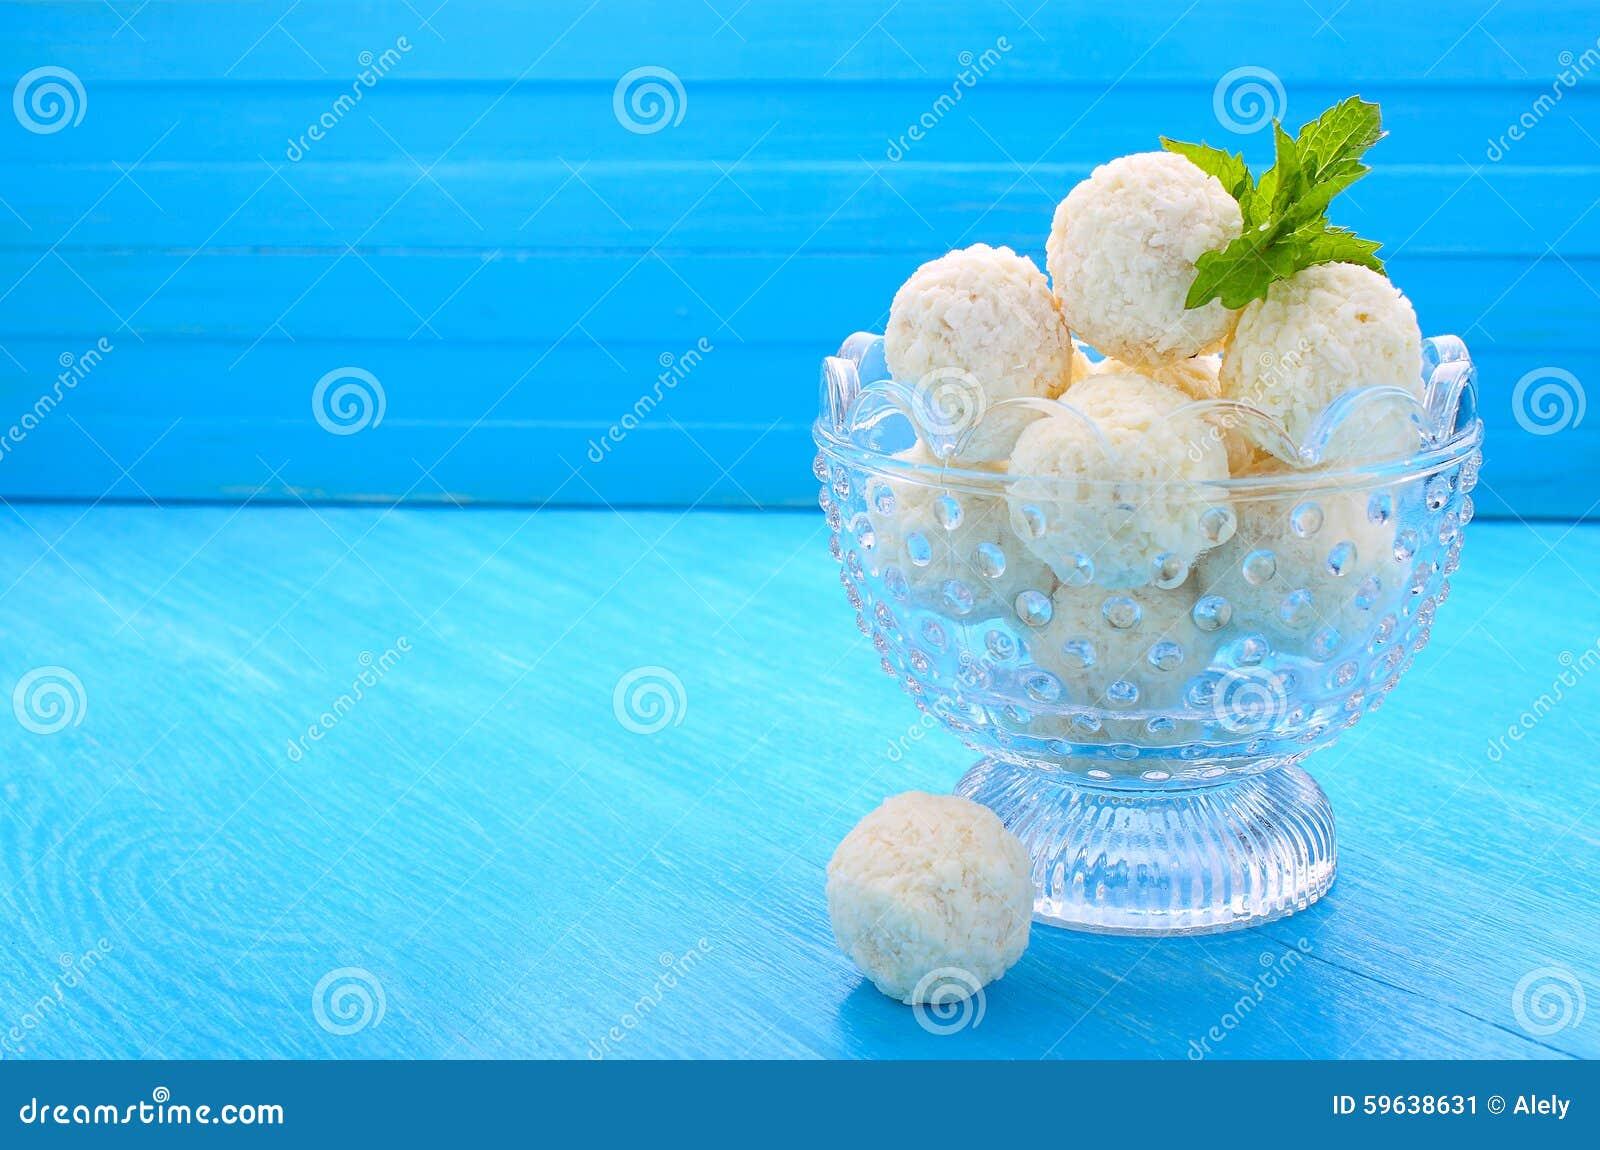 Sugar-coated sötsaker